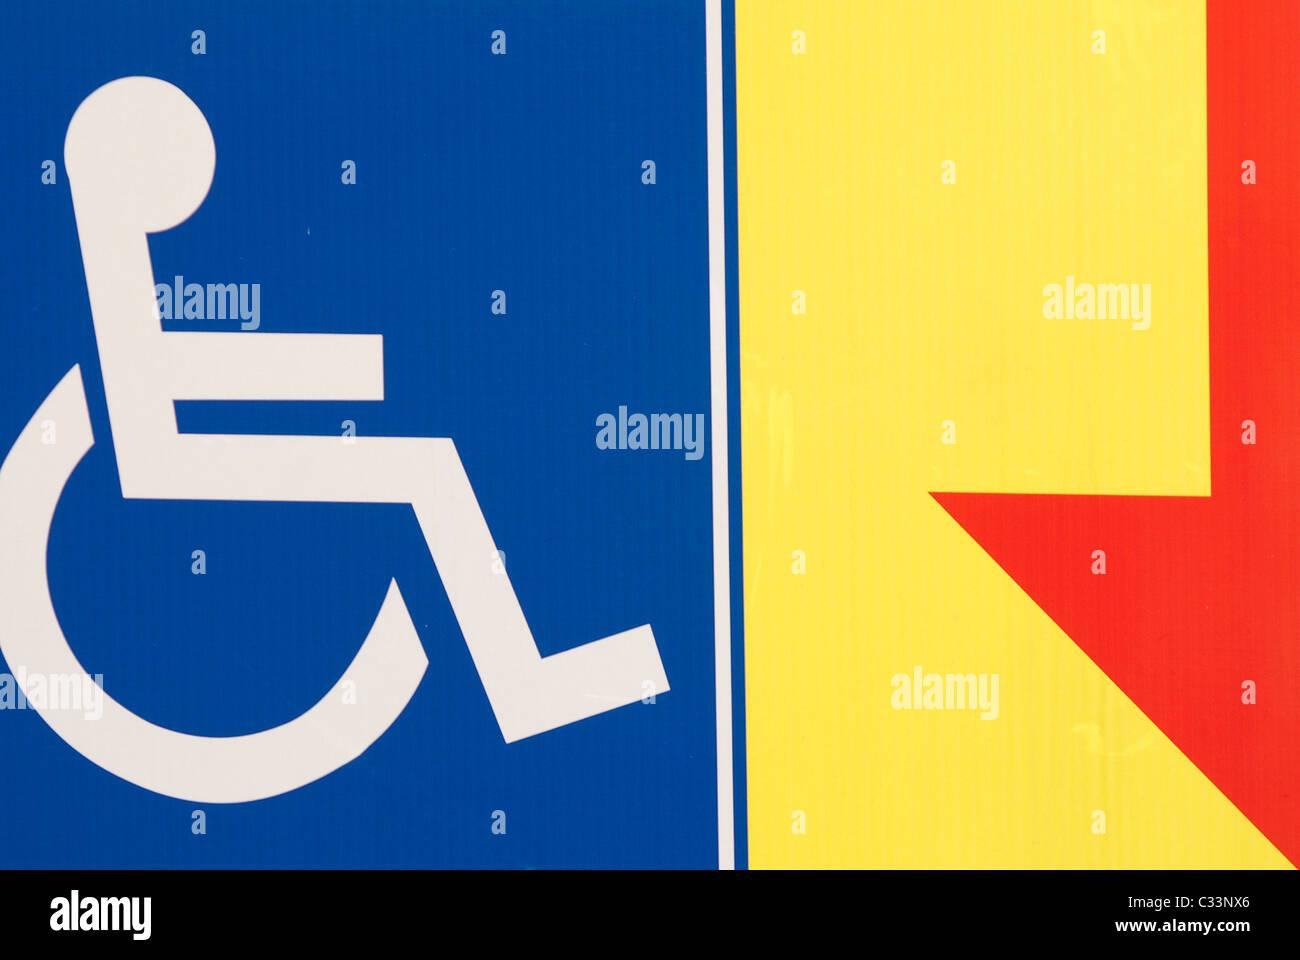 Behindertengerechter Zugang anmelden Stockbild